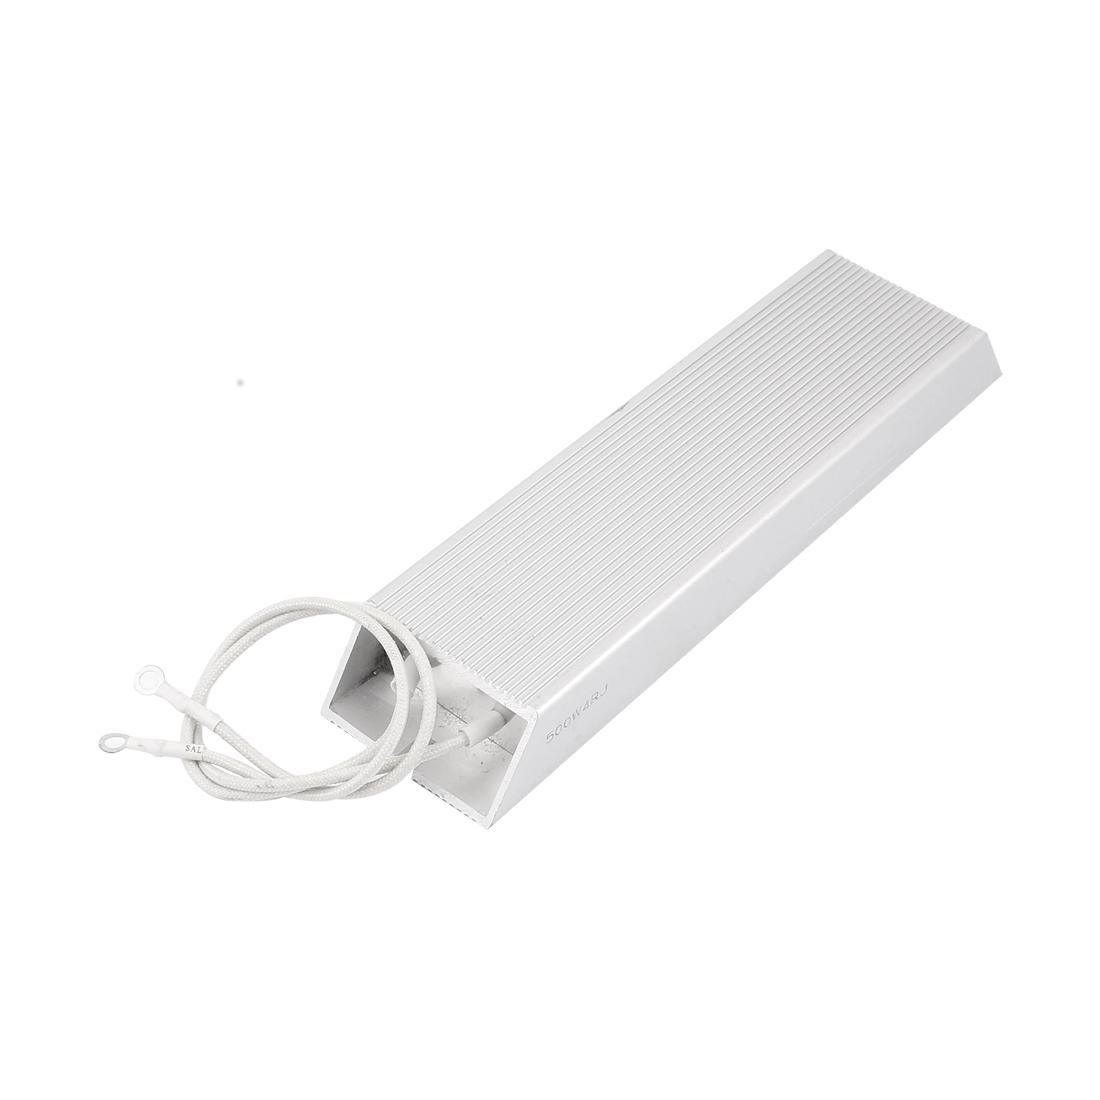 500W 4 Ohm Solder Lug Terminals Aluminium Housing Braking Resistor Resistance